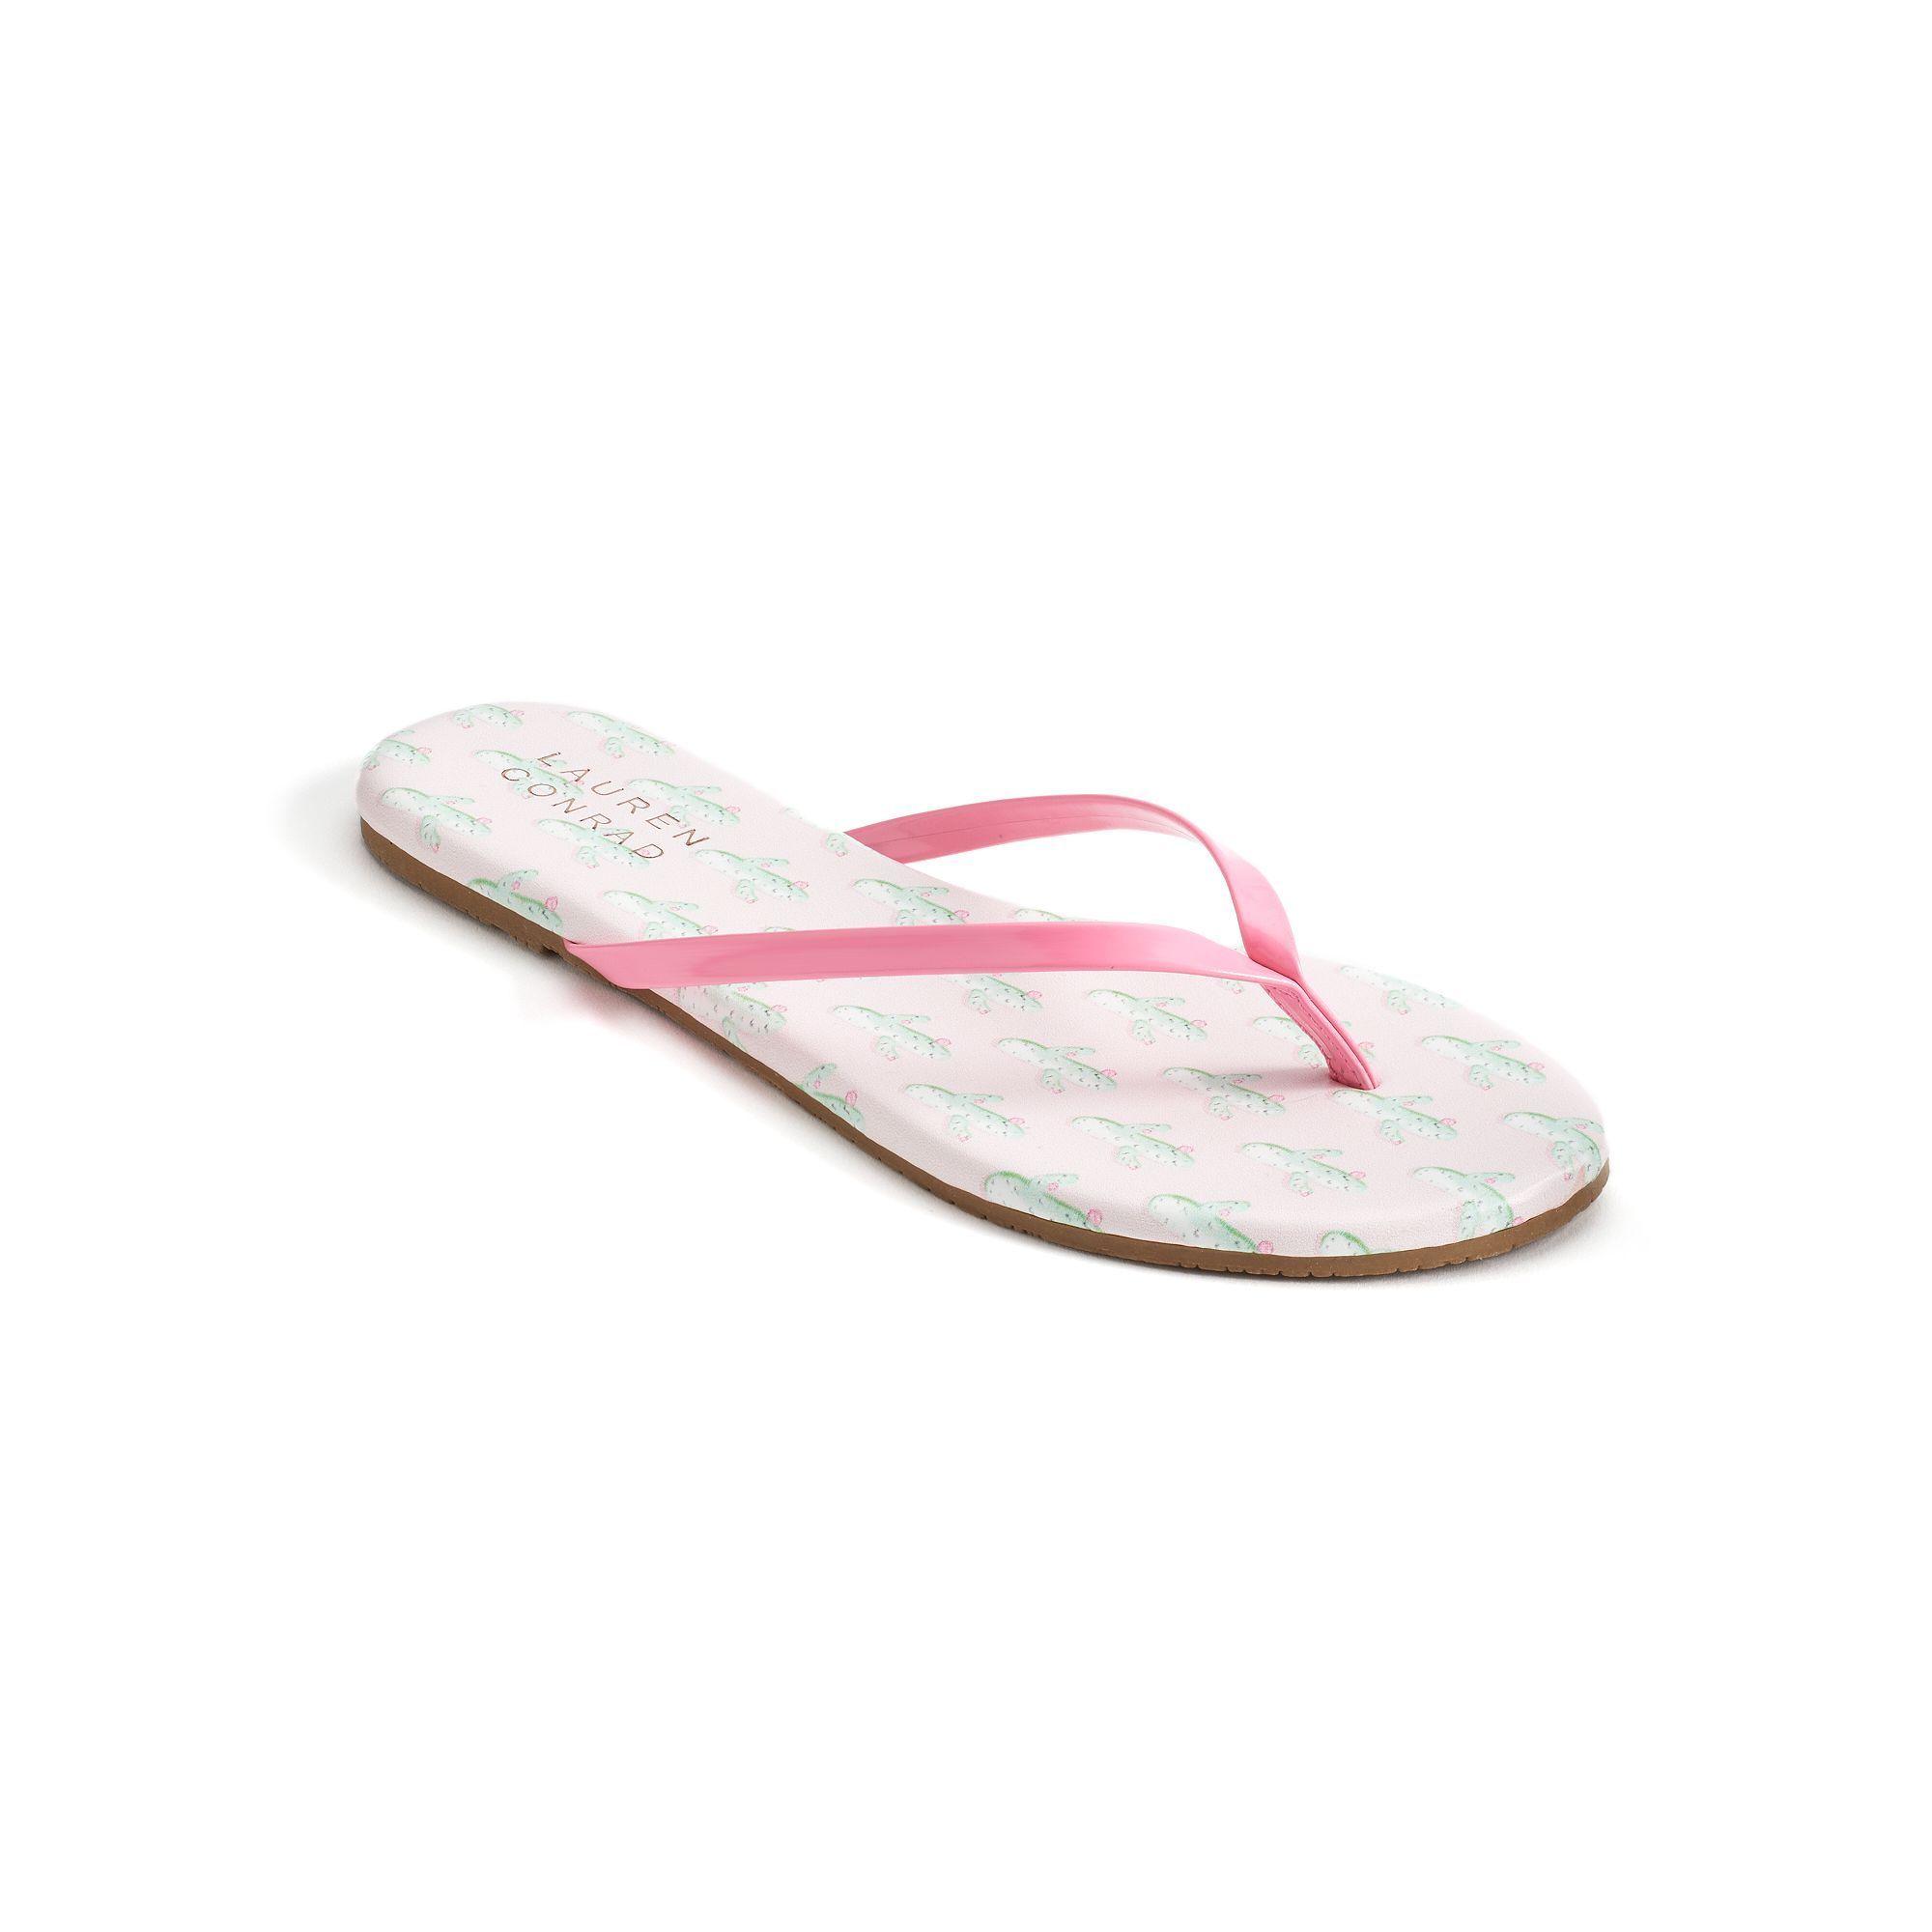 9c9876b0da60 LC Lauren Conrad Pixii Women s Flip Flops